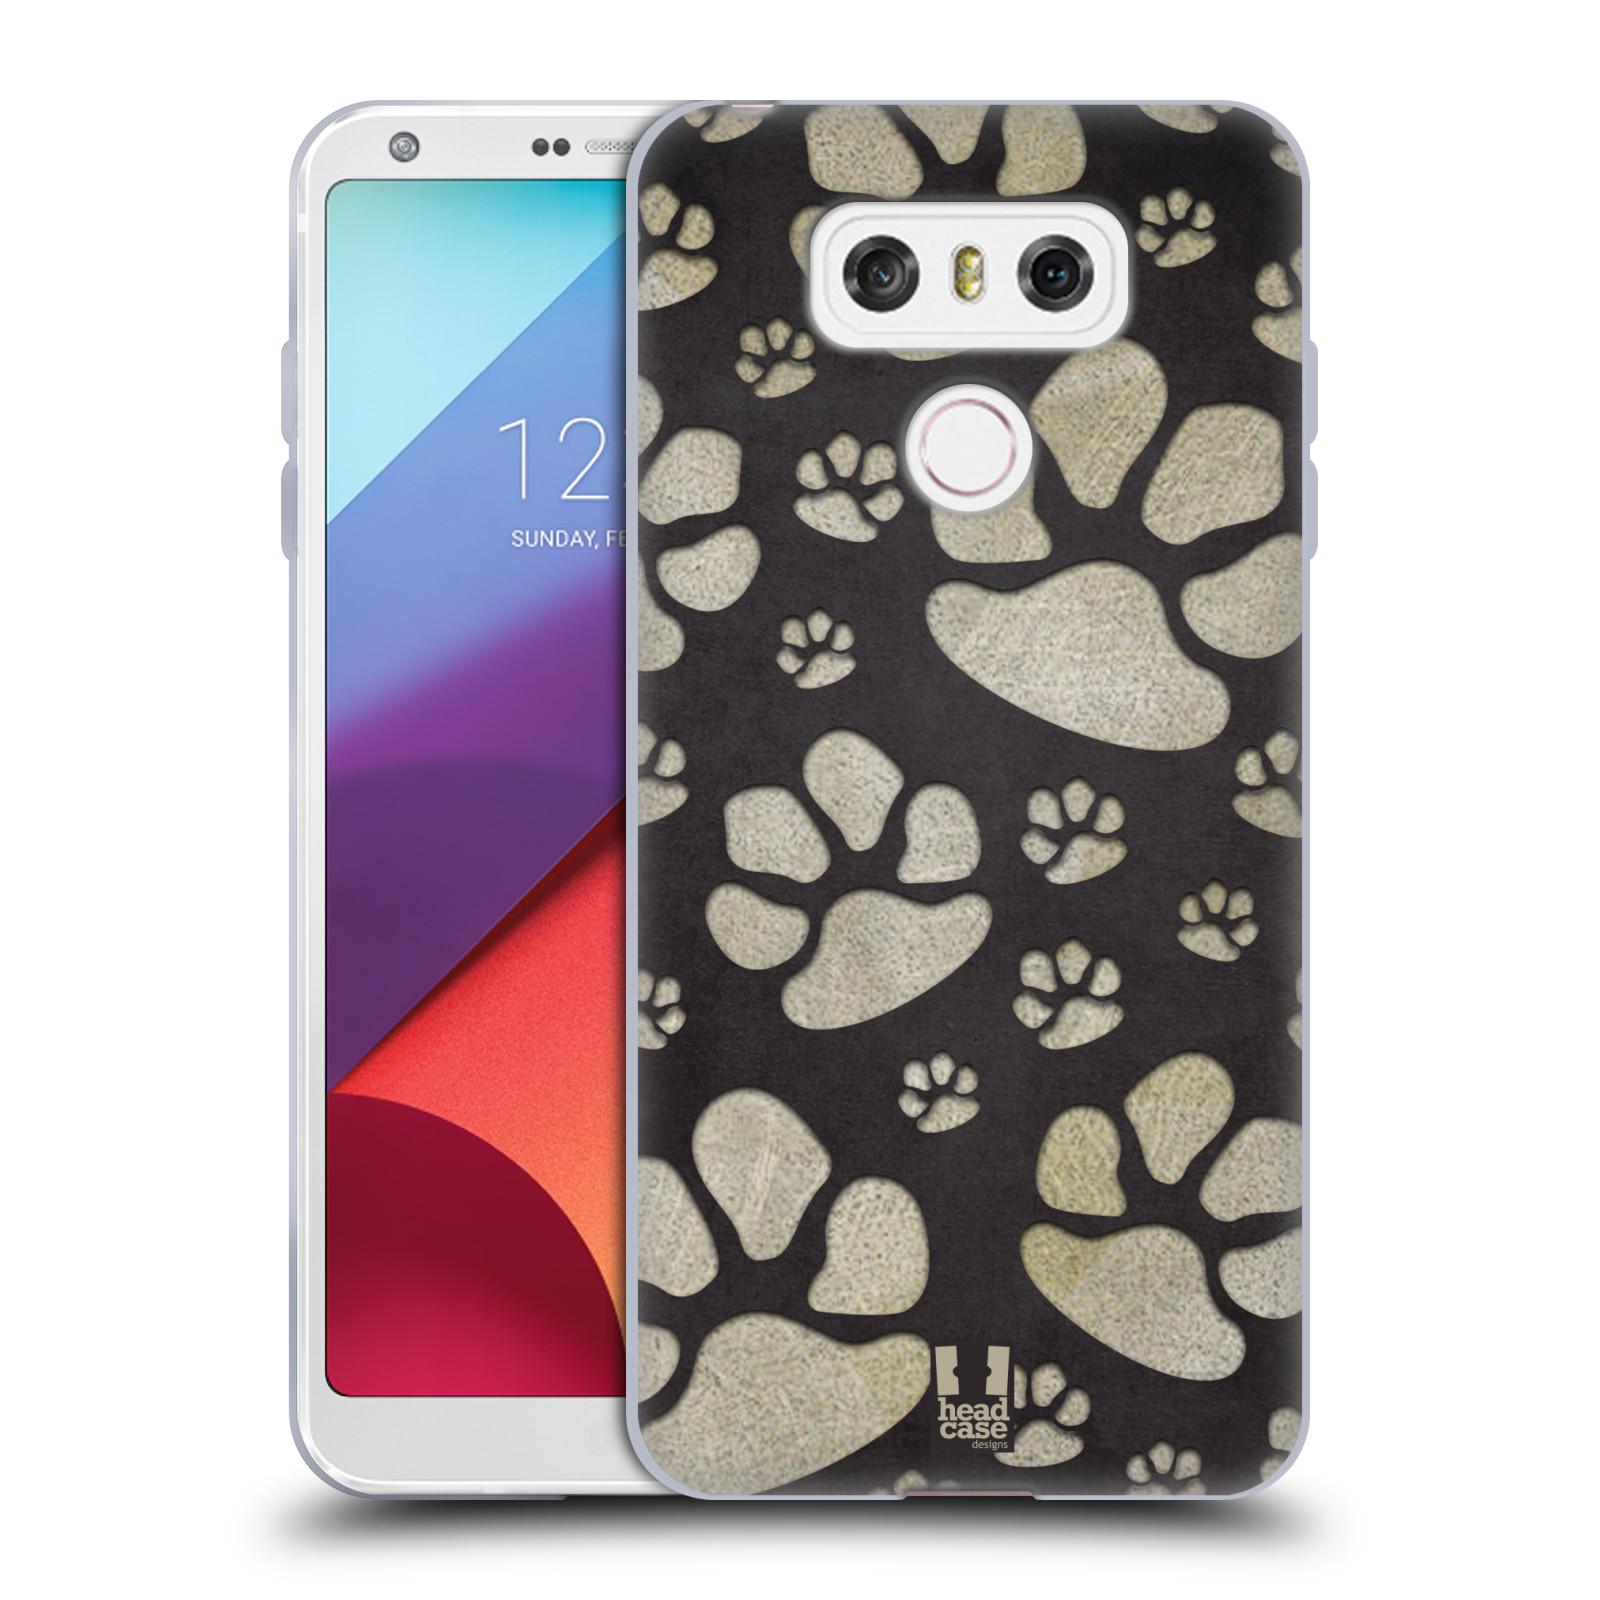 Silikonové pouzdro na mobil LG G6 - Head Case TLAPKY ŠEDÉ (Silikonový kryt či obal na mobilní telefon LG G6 H870 / LG G6 Dual SIM H870DS)